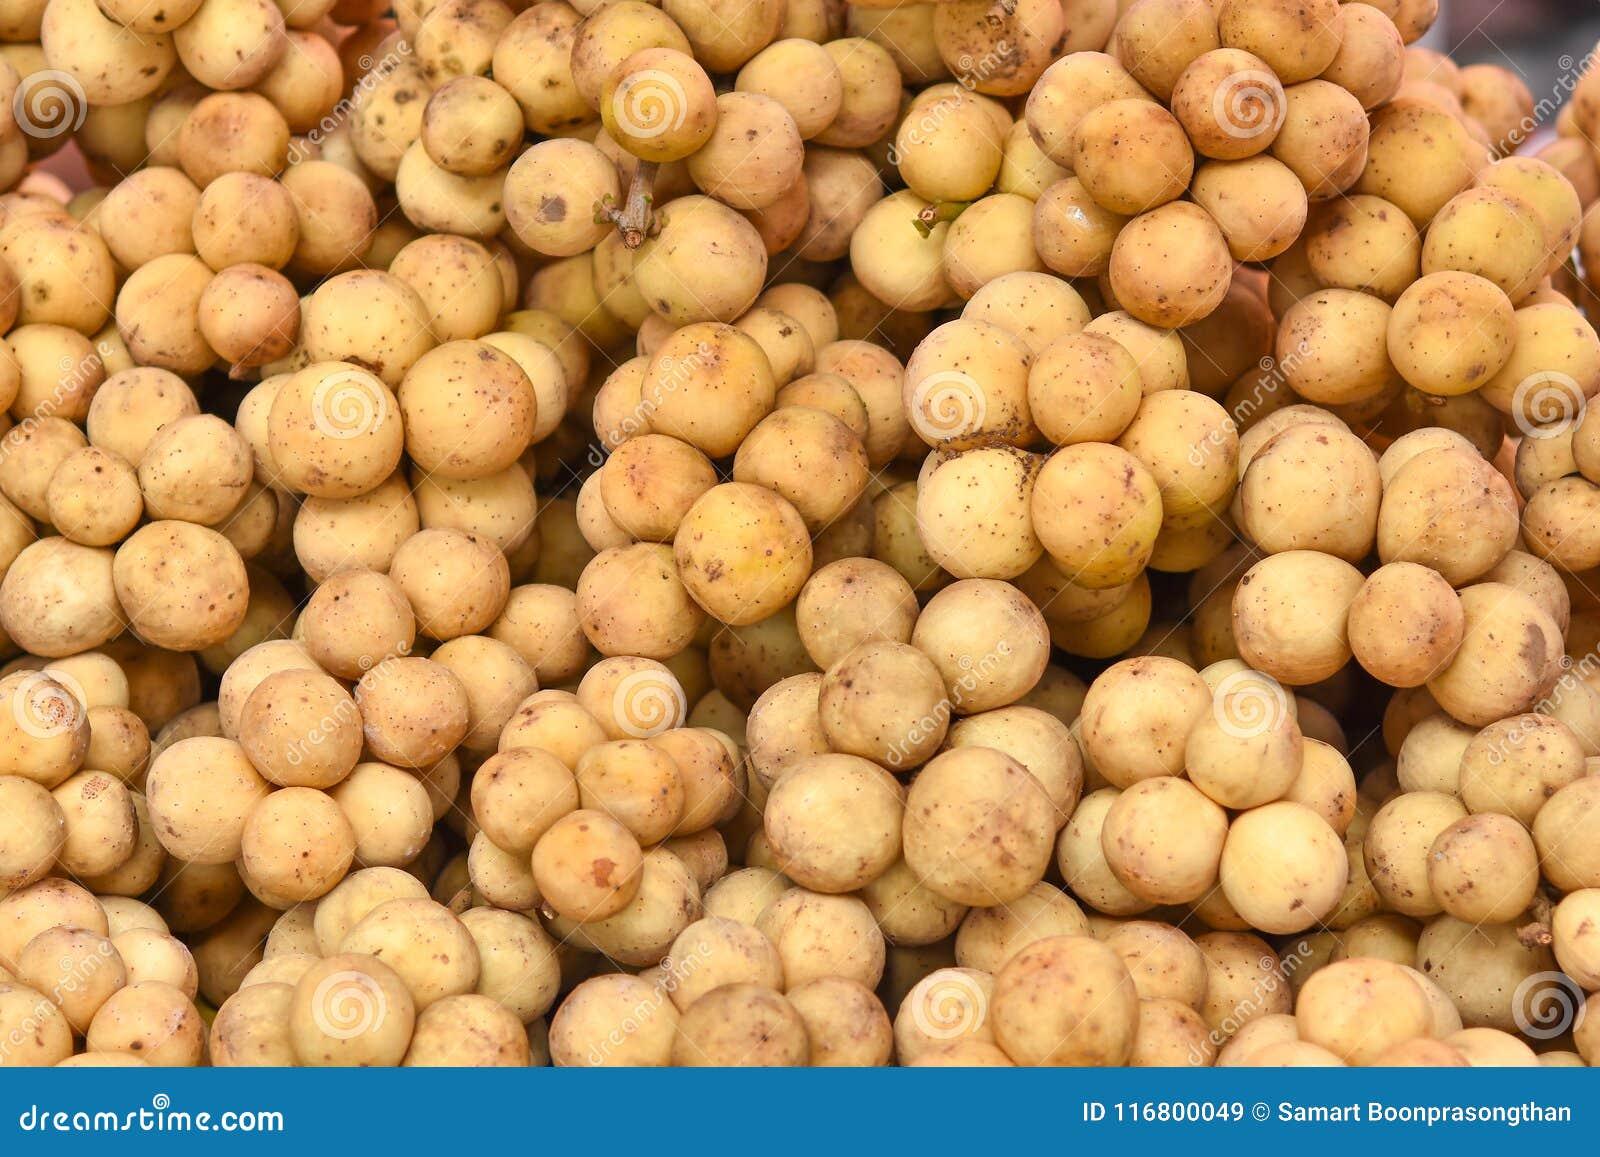 Il lansium domesticum o Longkong è i frutti tropicali tailandesi